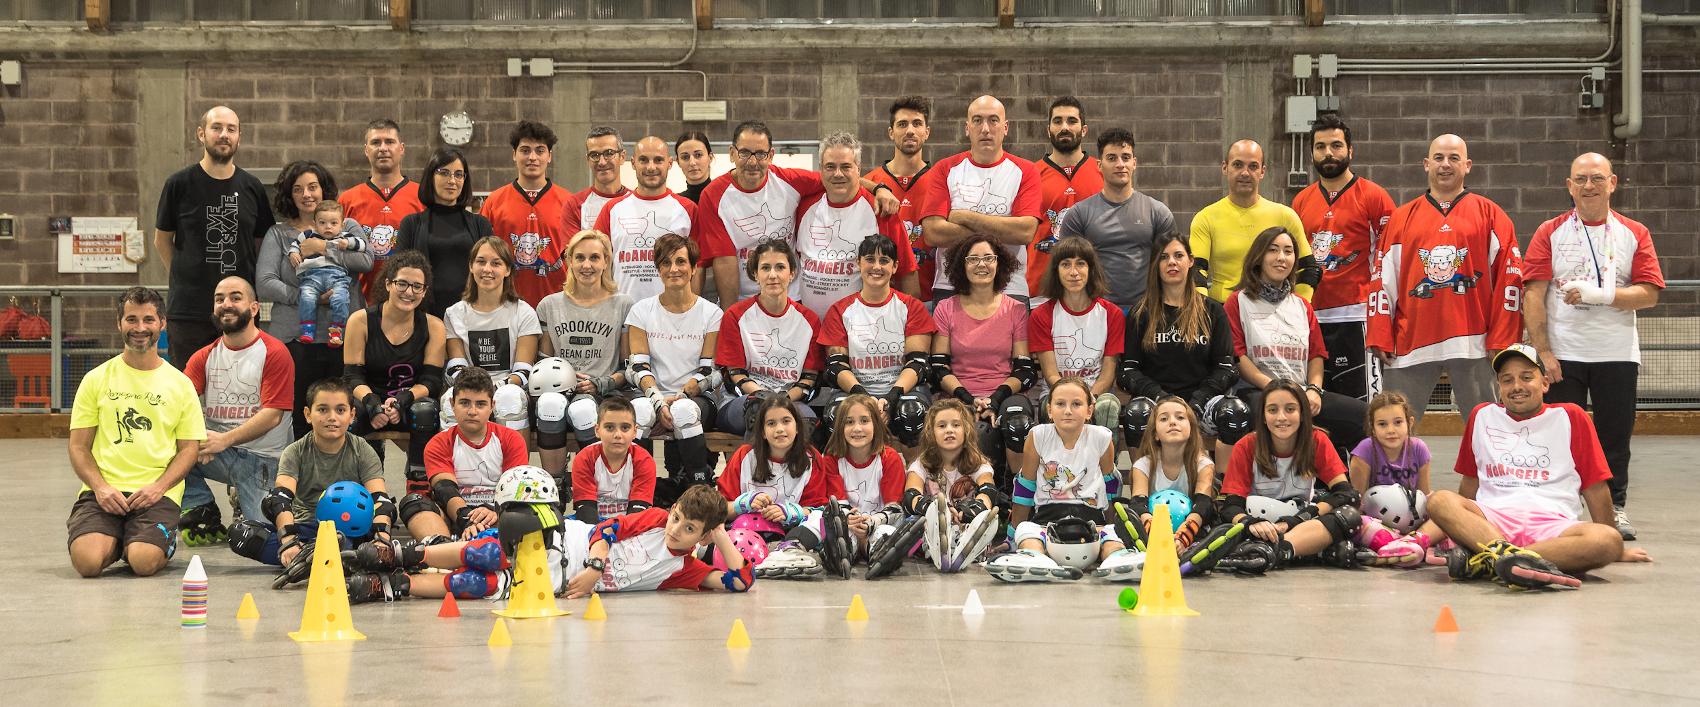 NoAngels Rimini 2019/20